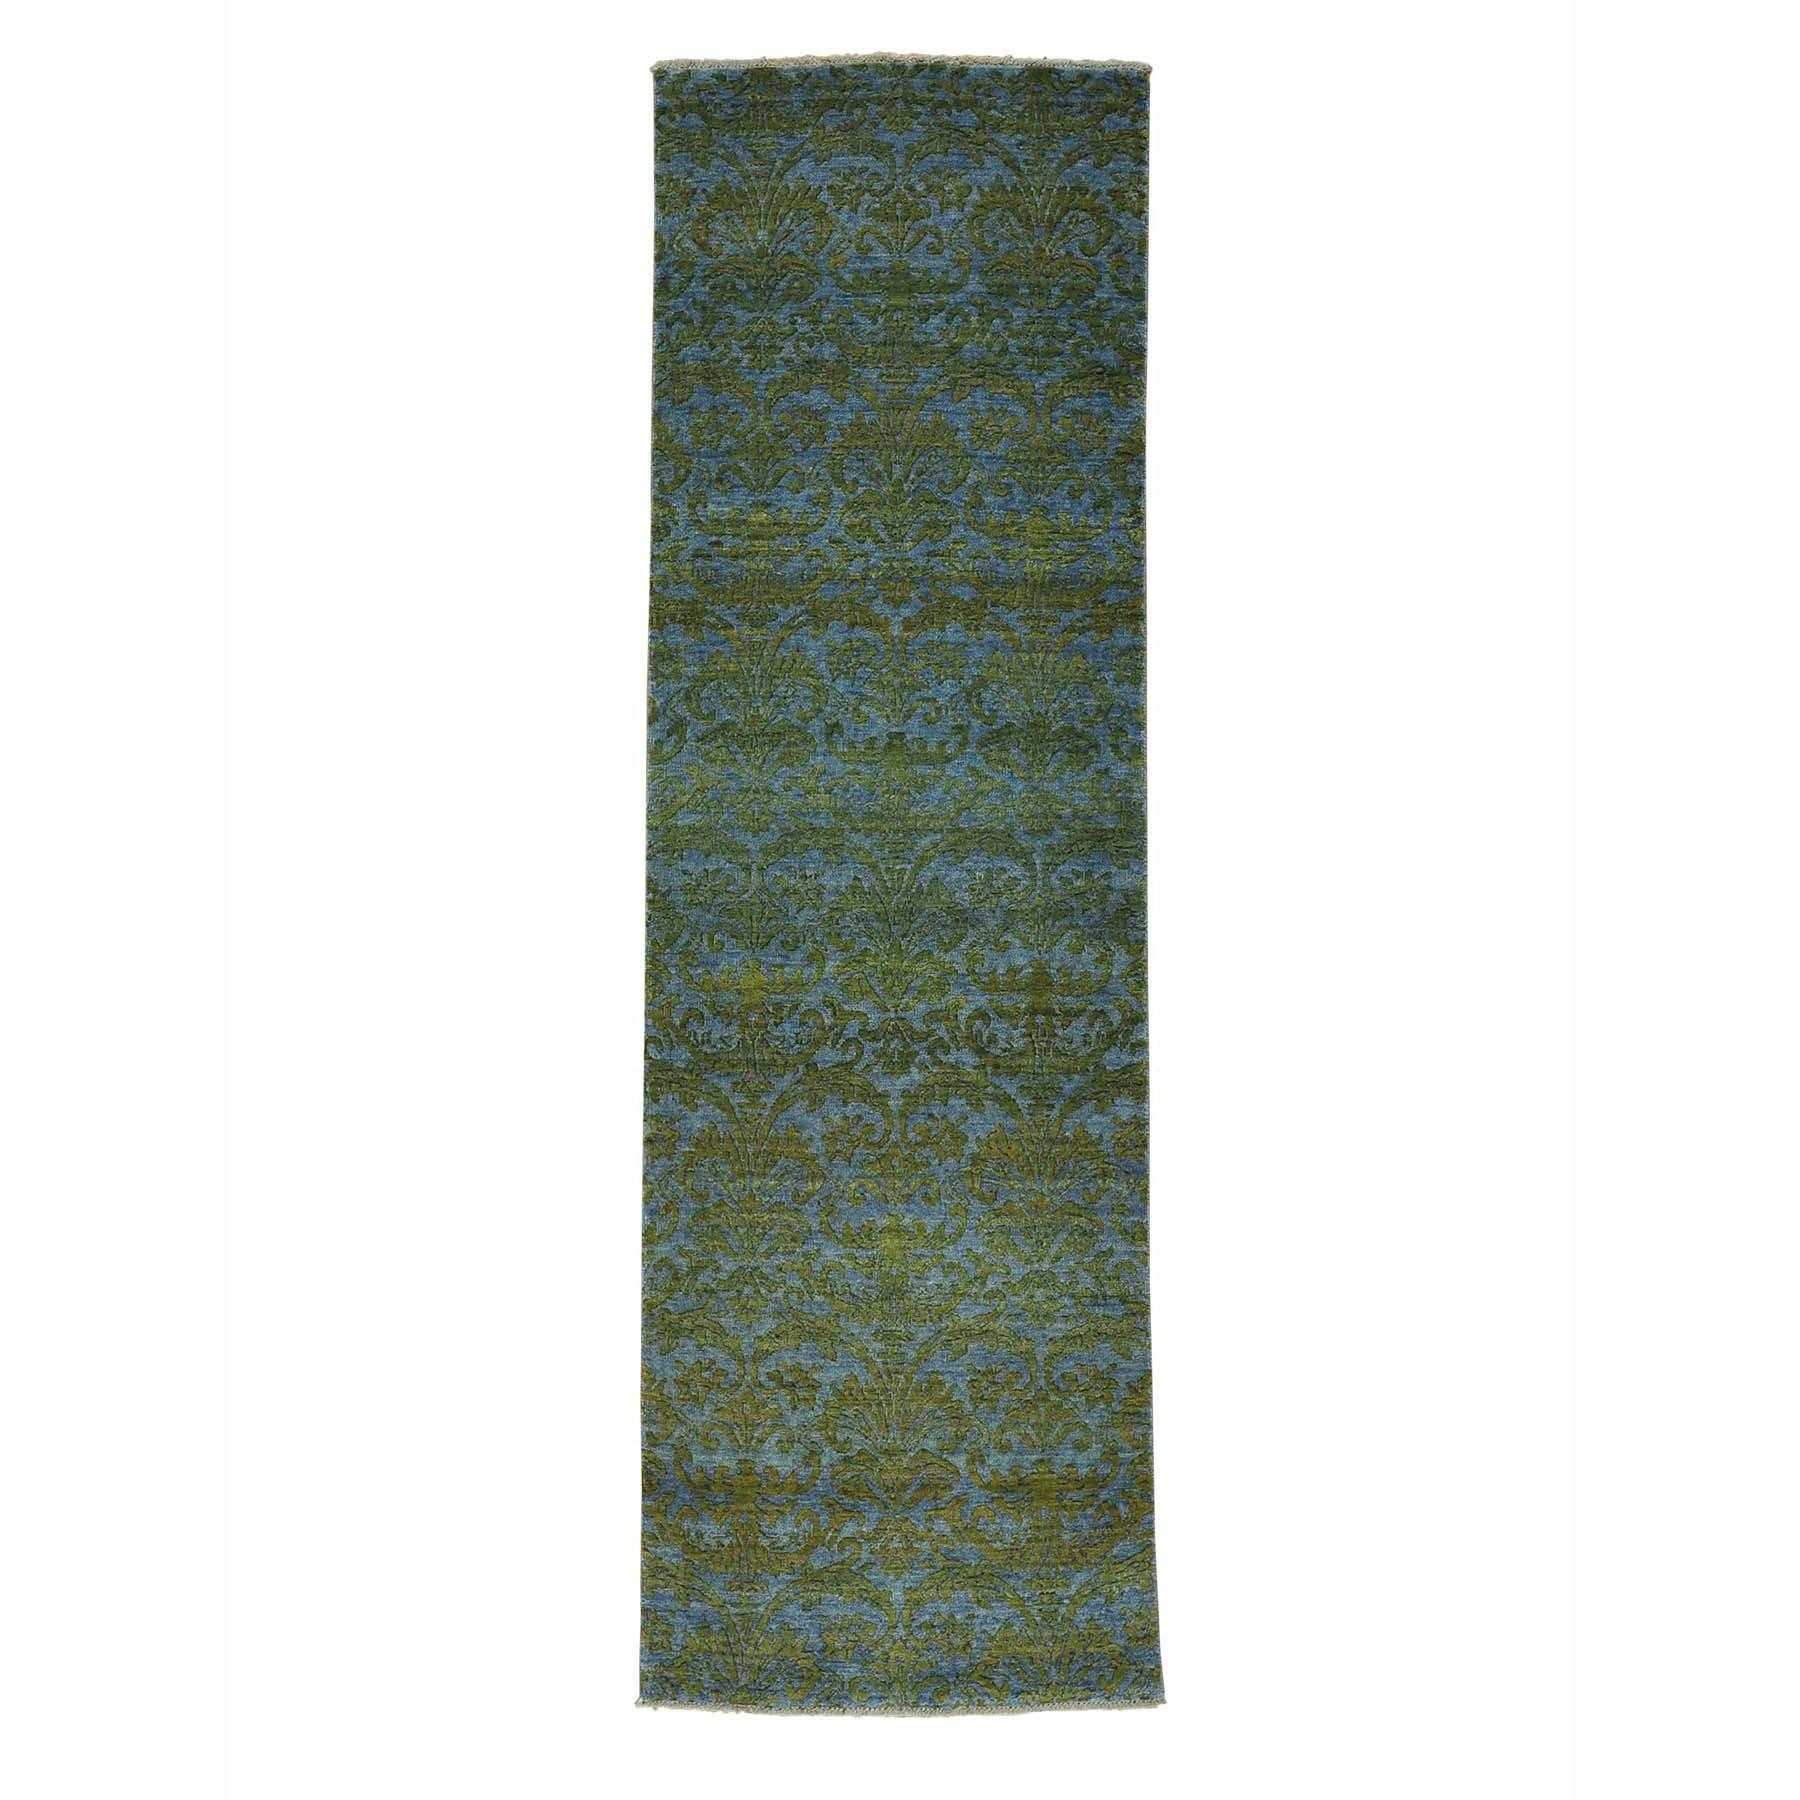 "2'5""X7'9"" Wool And Silk Tone On Tone Damask Runner Handmade Oriental Rug moab7bce"